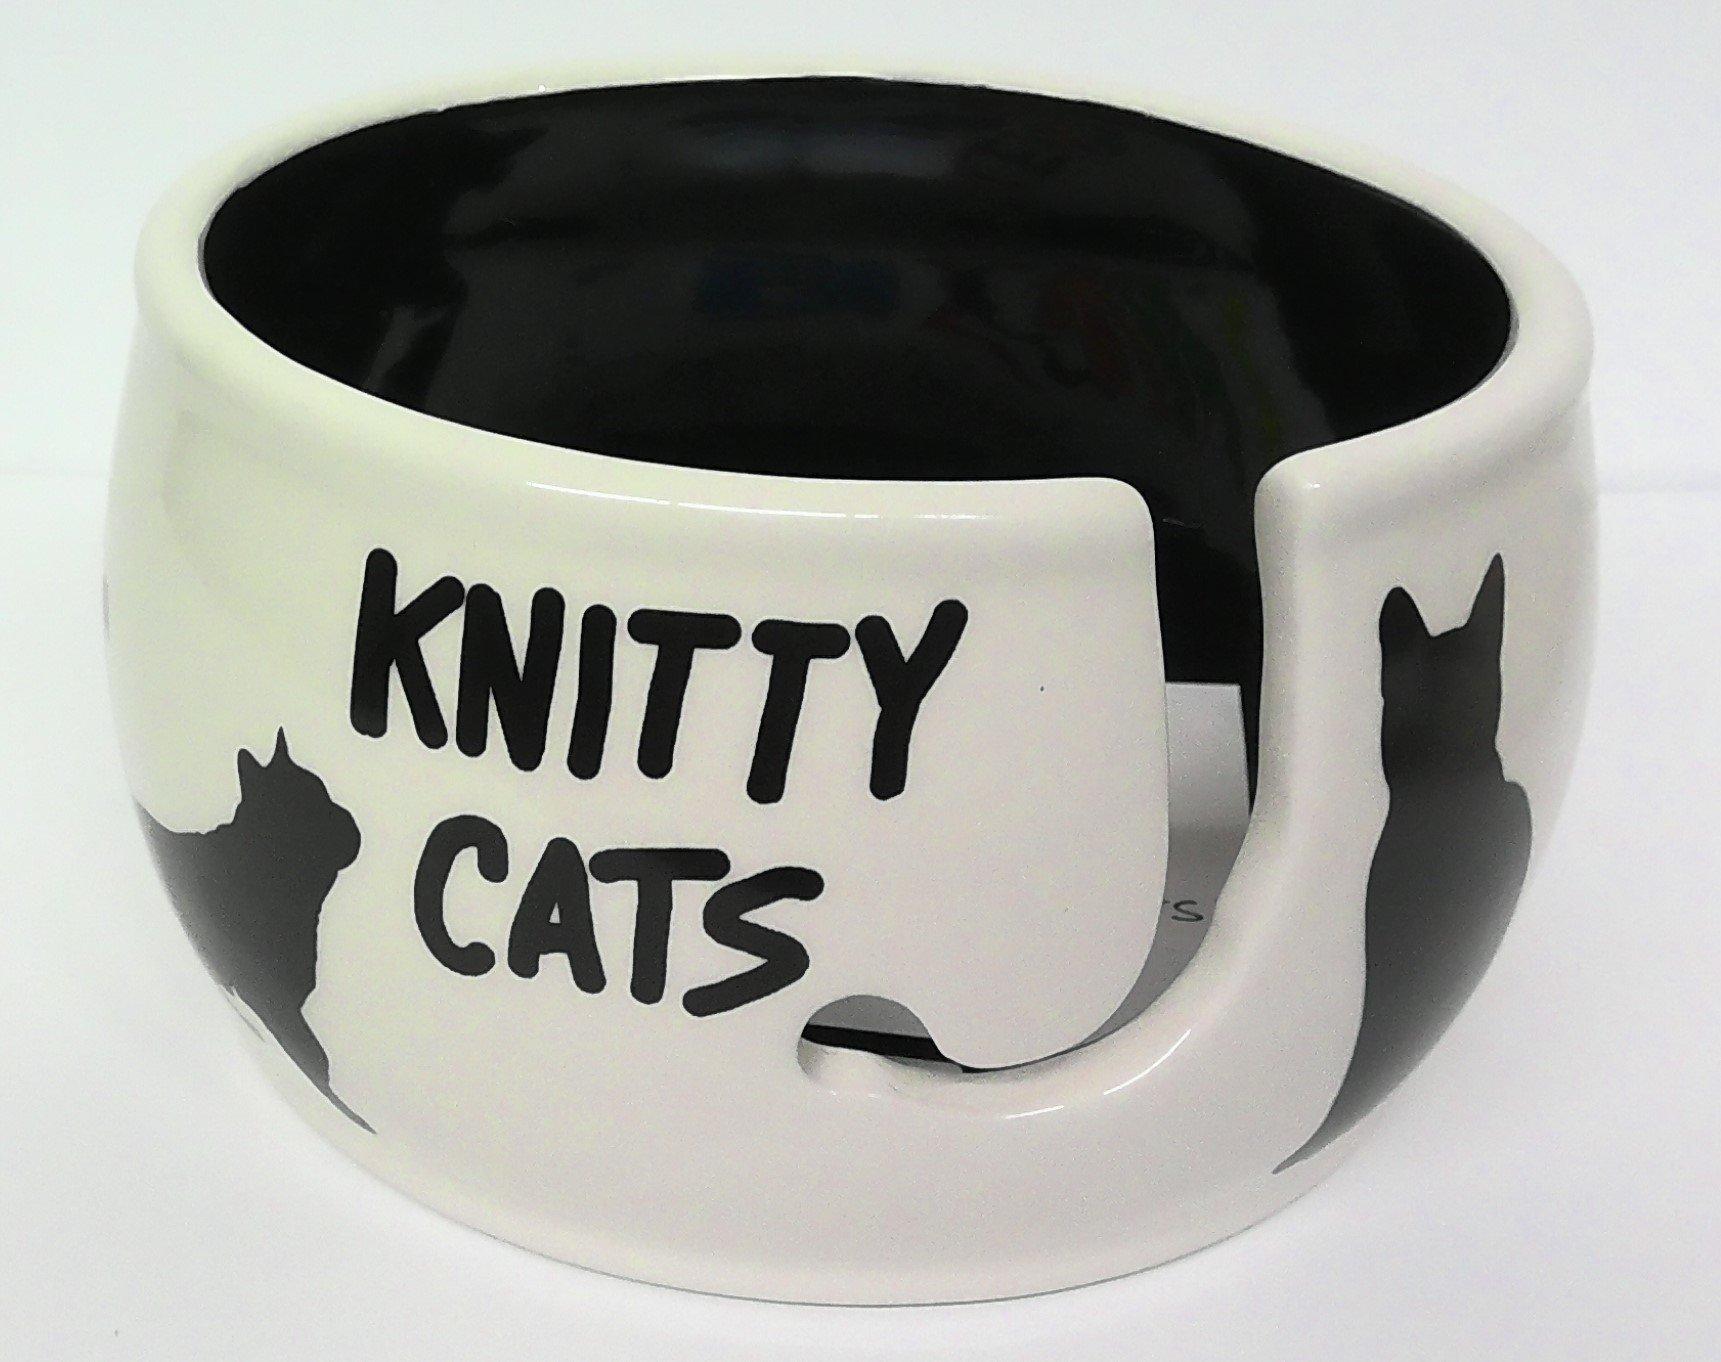 Lenny Mud Knitty Cats Yarn Bowl